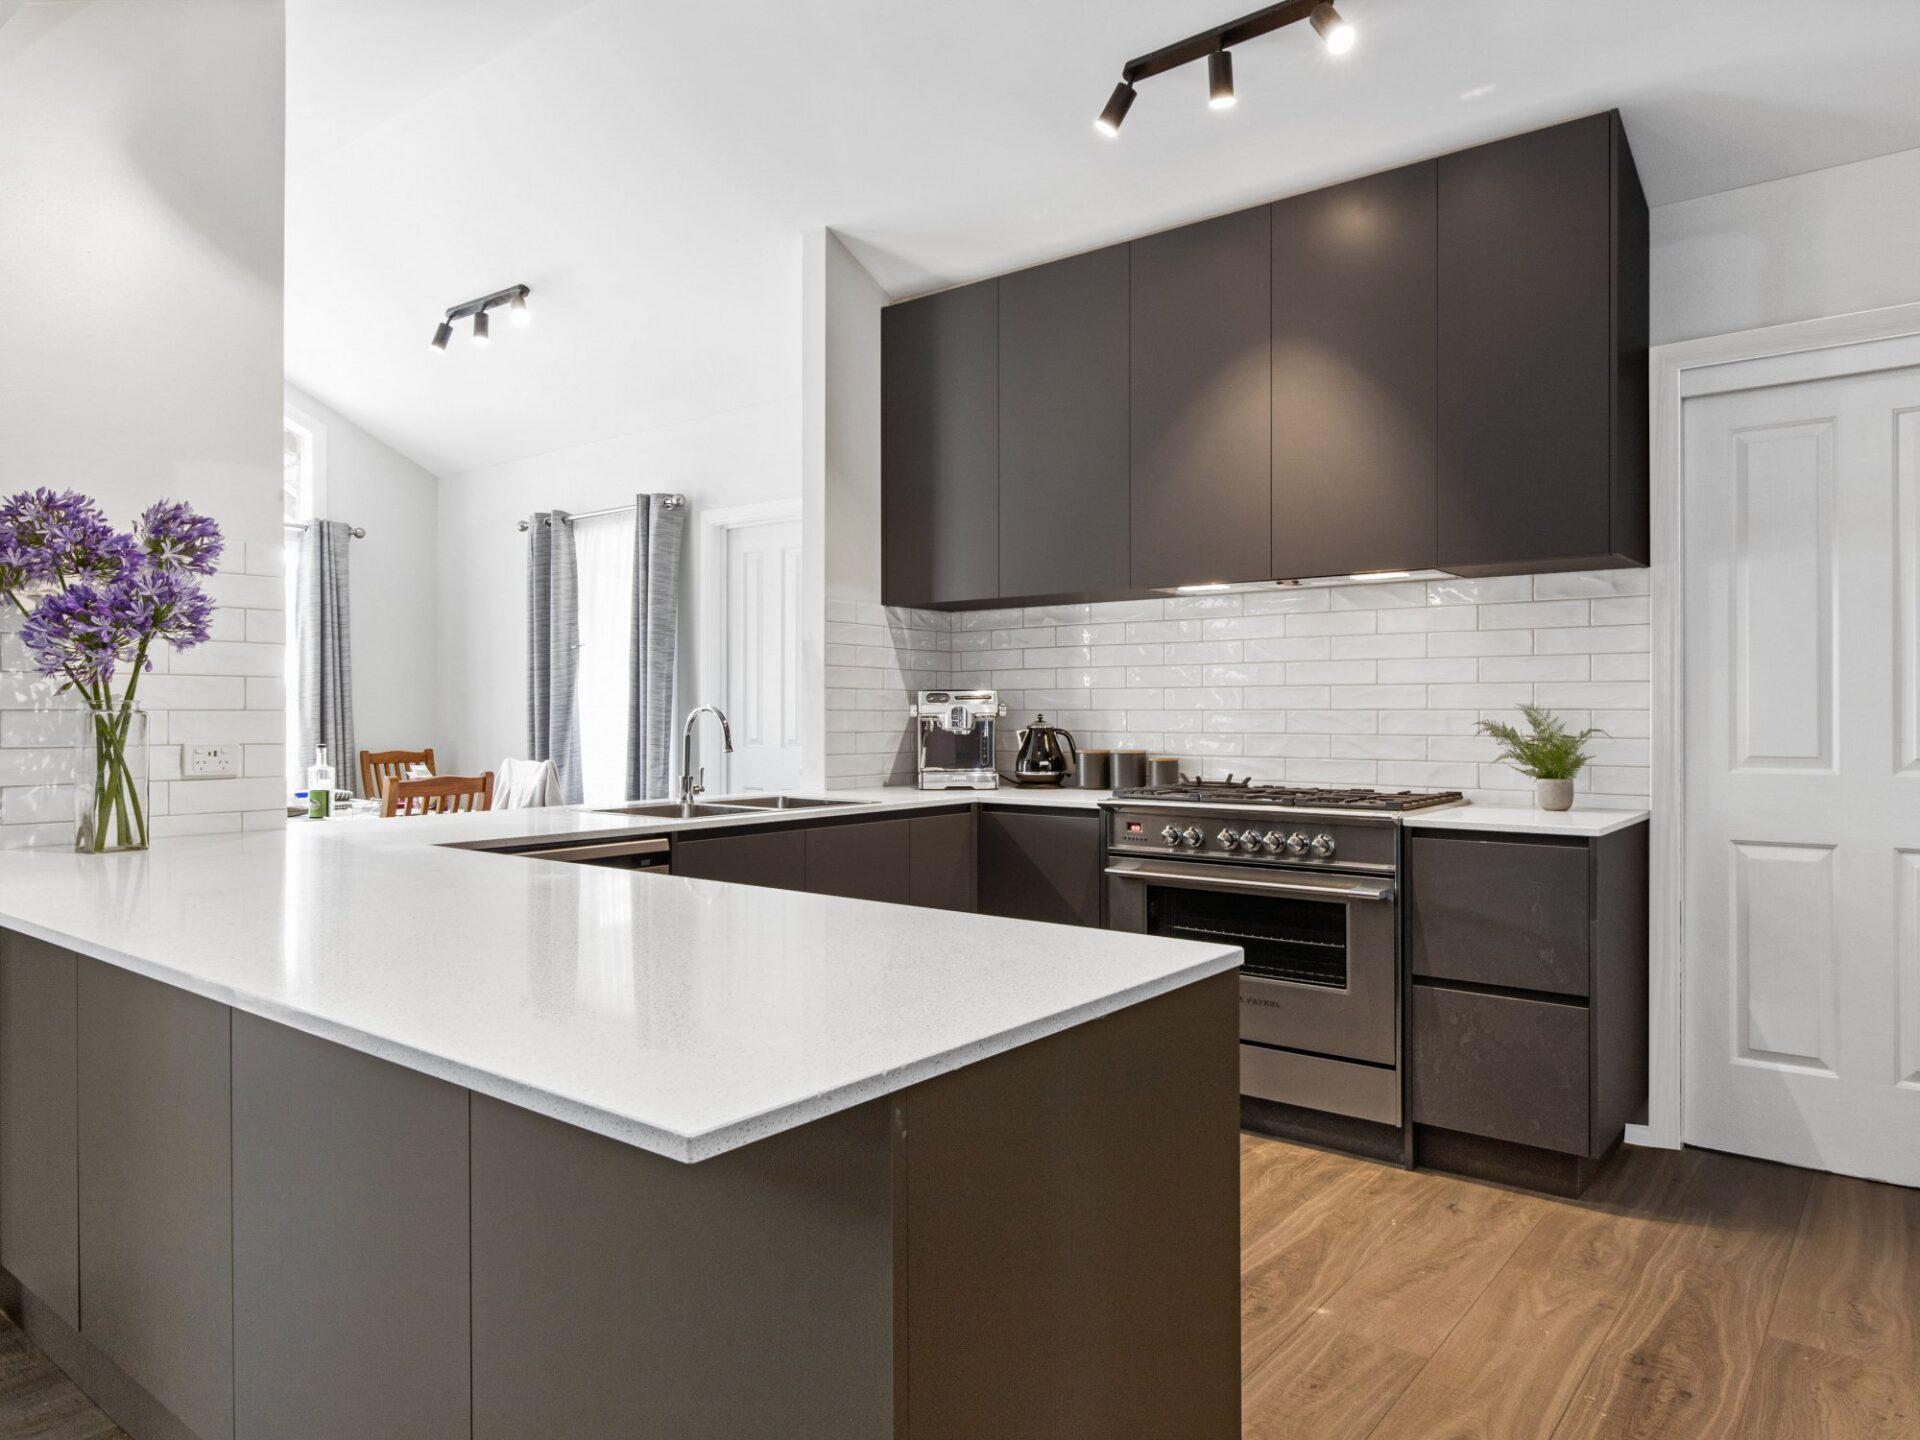 Kitchen Appliances Renovations by Bayview Renovations